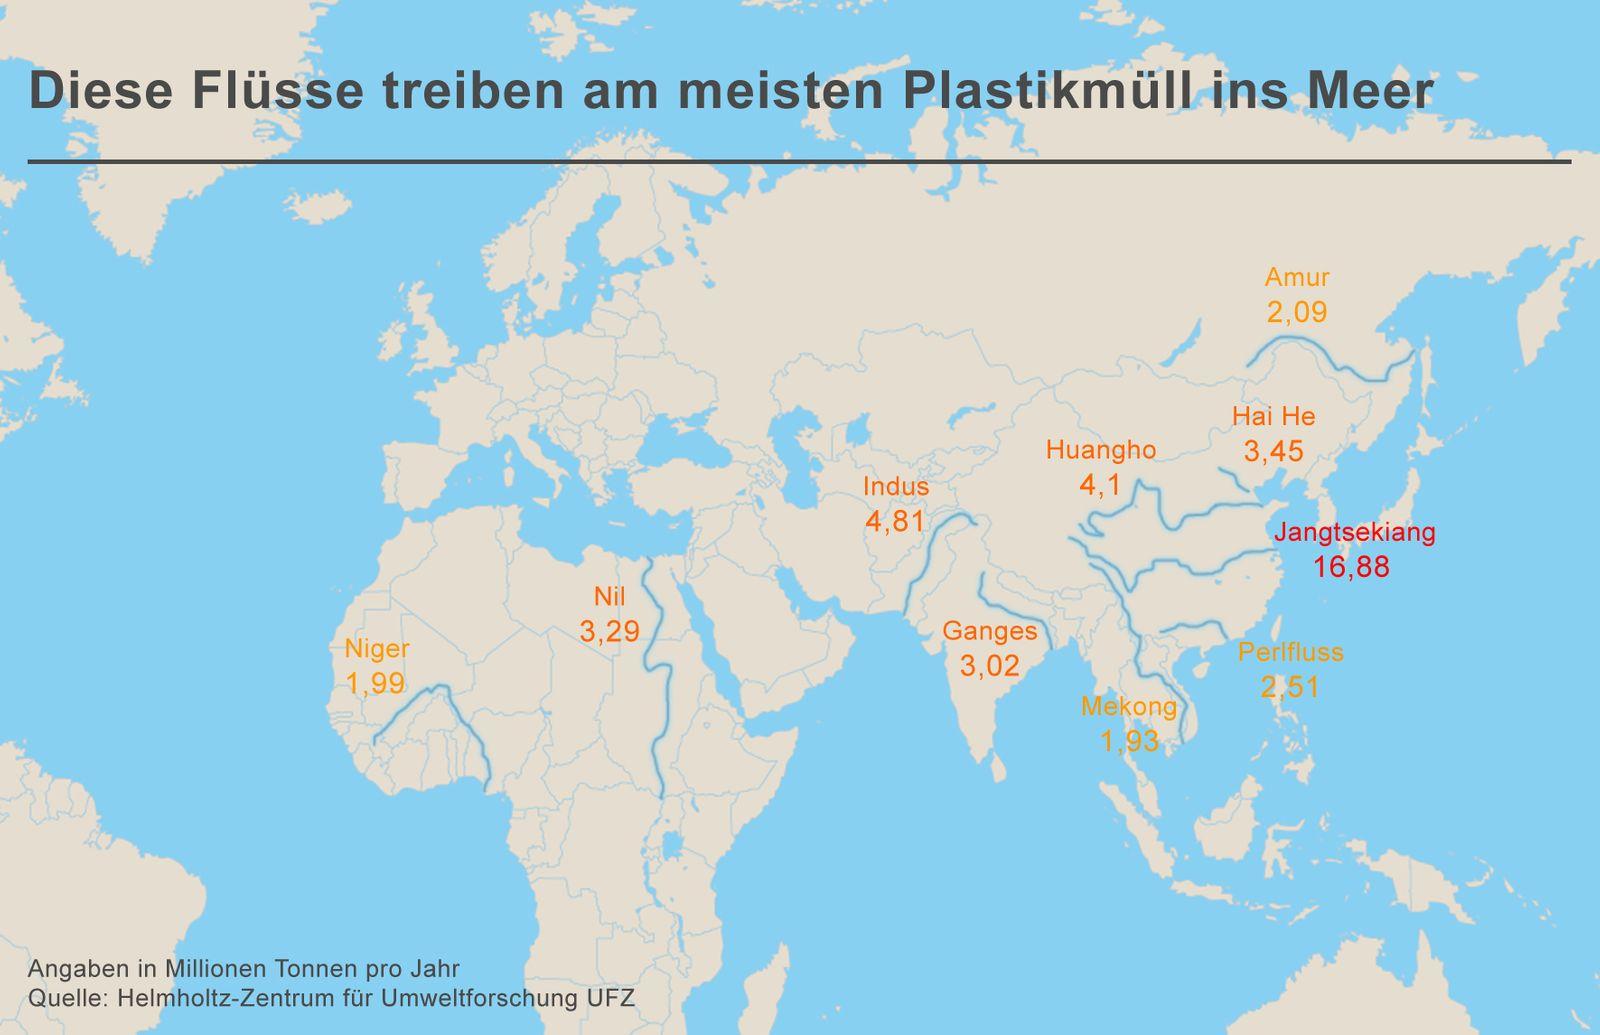 GRAFIK Flüsse Plastikmüll in Meere